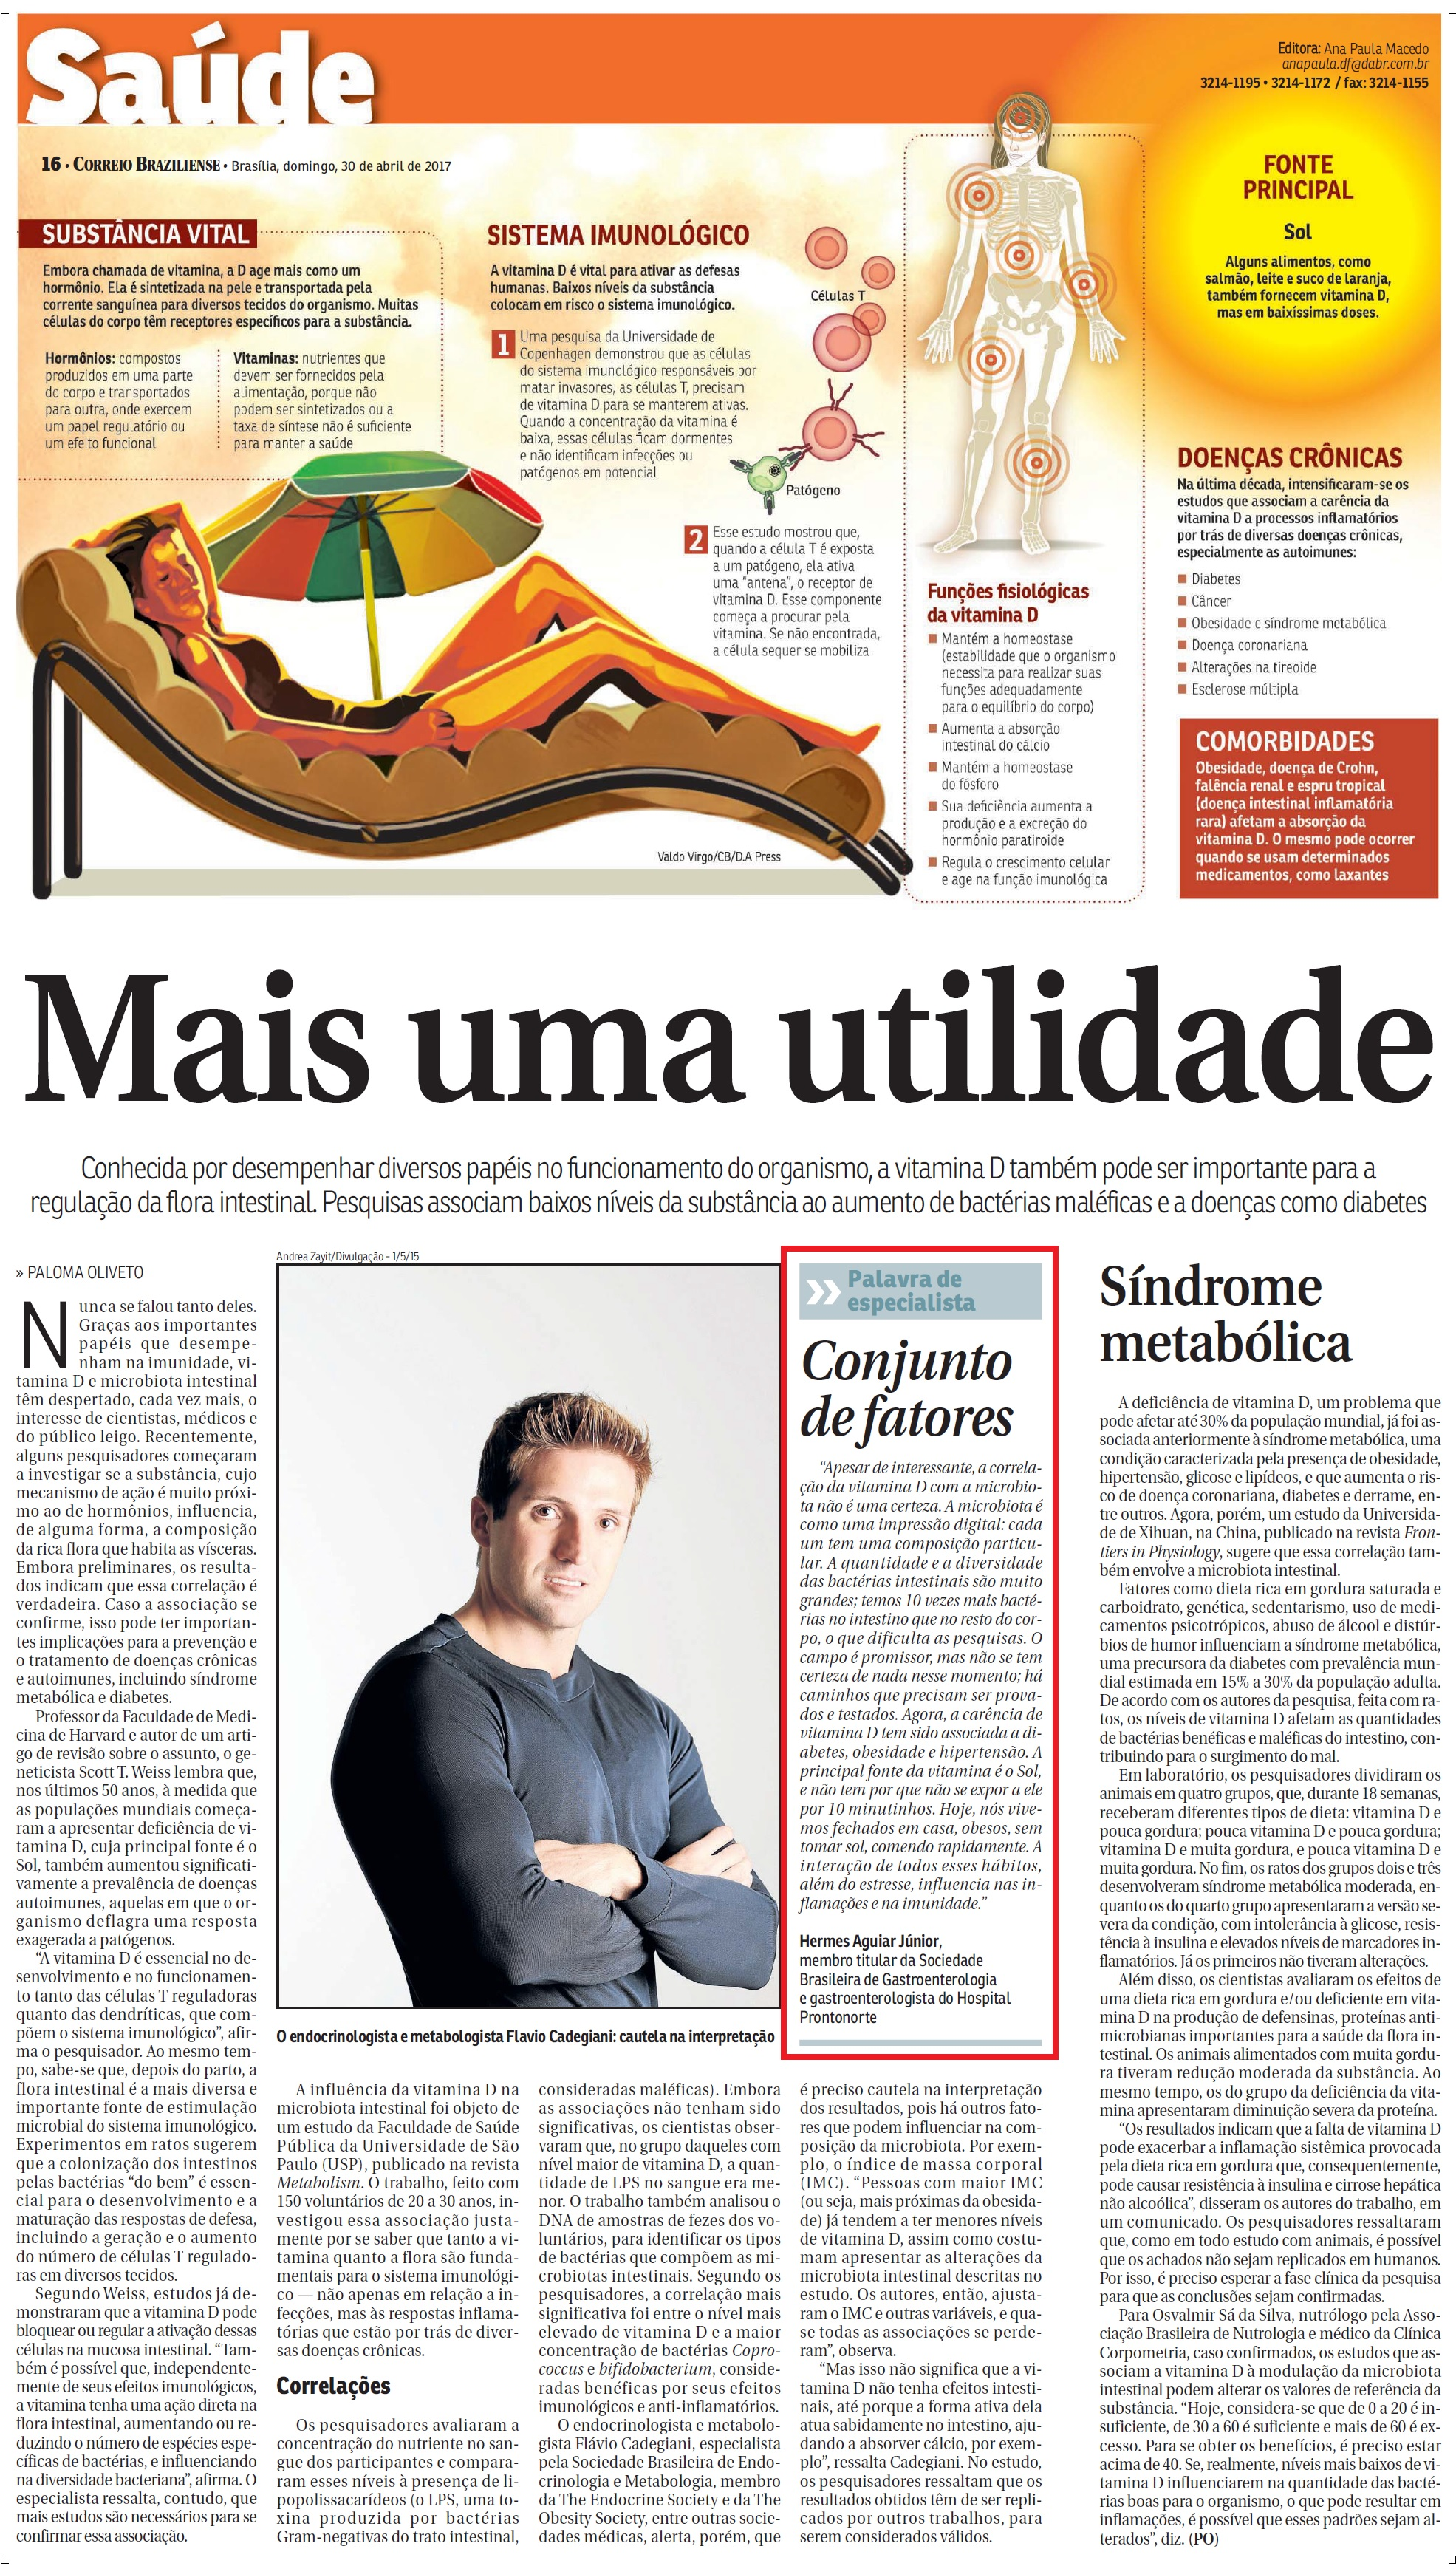 Correio Braziliense - Dr. Hermes Júnior HSLN - 30-04-2017